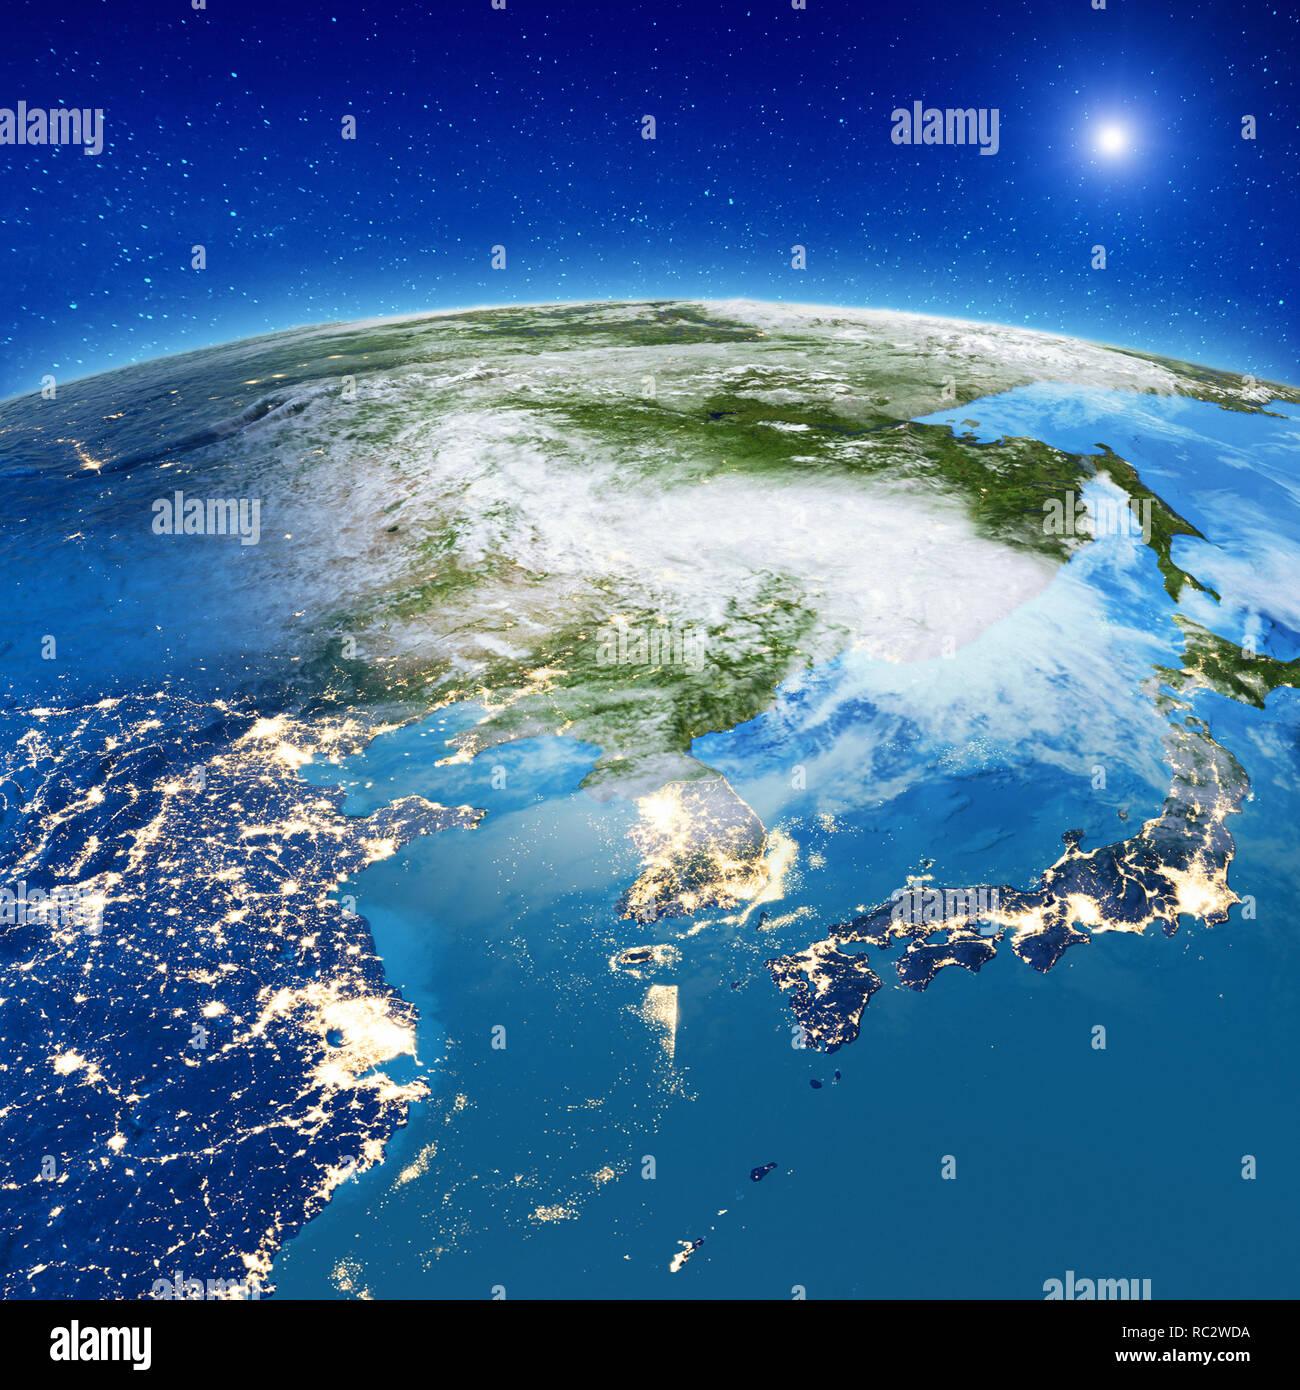 Asia - China, Japan and South Korea - Stock Image